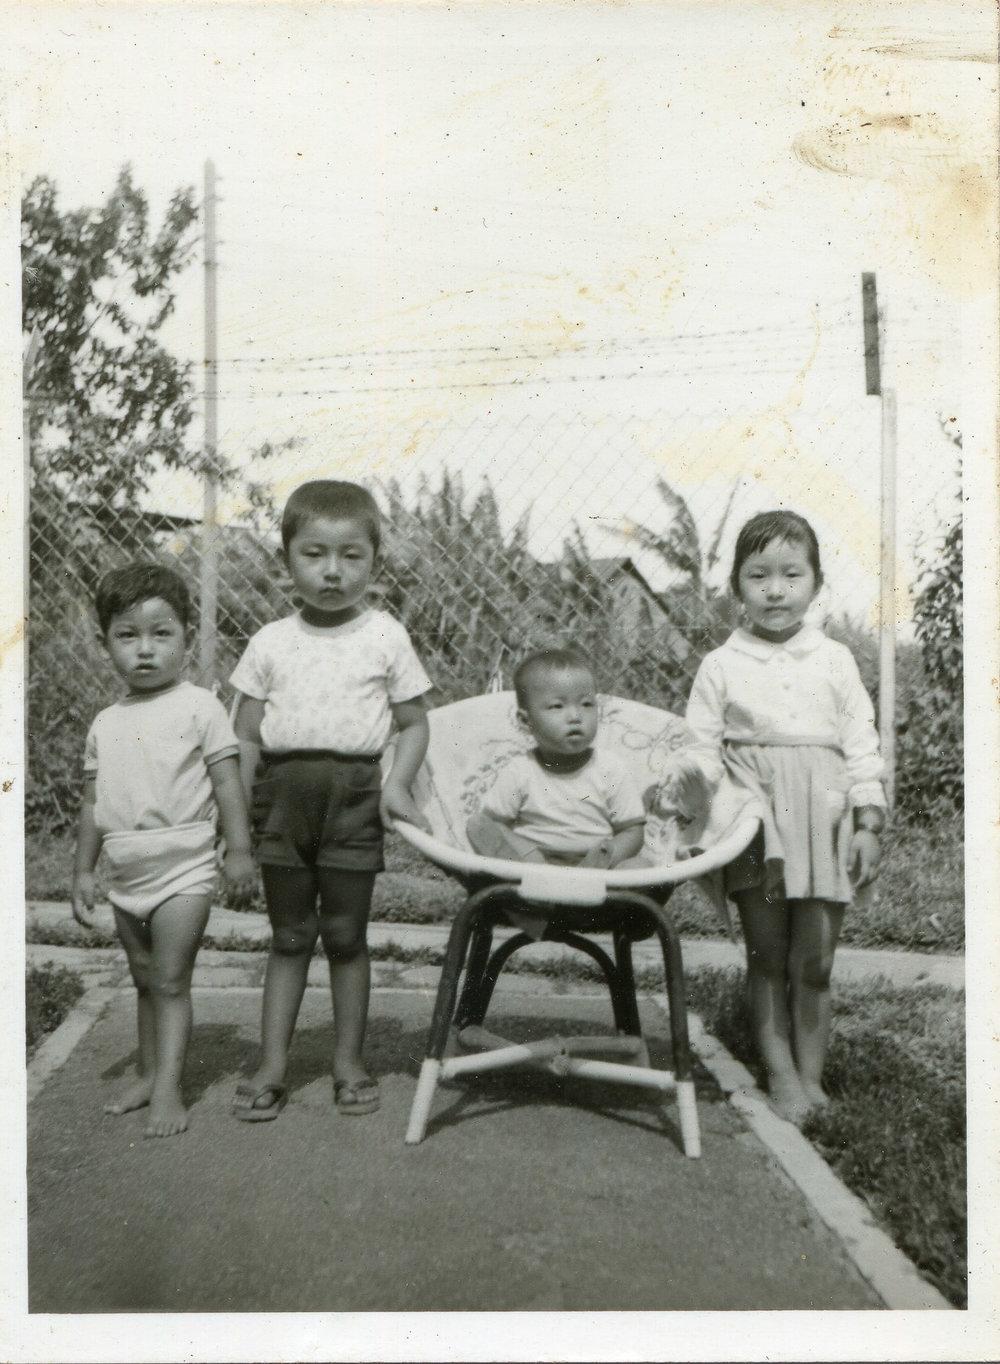 singapore-gurkhas-archive-photo-museum-zakaria-zainal-7.jpg